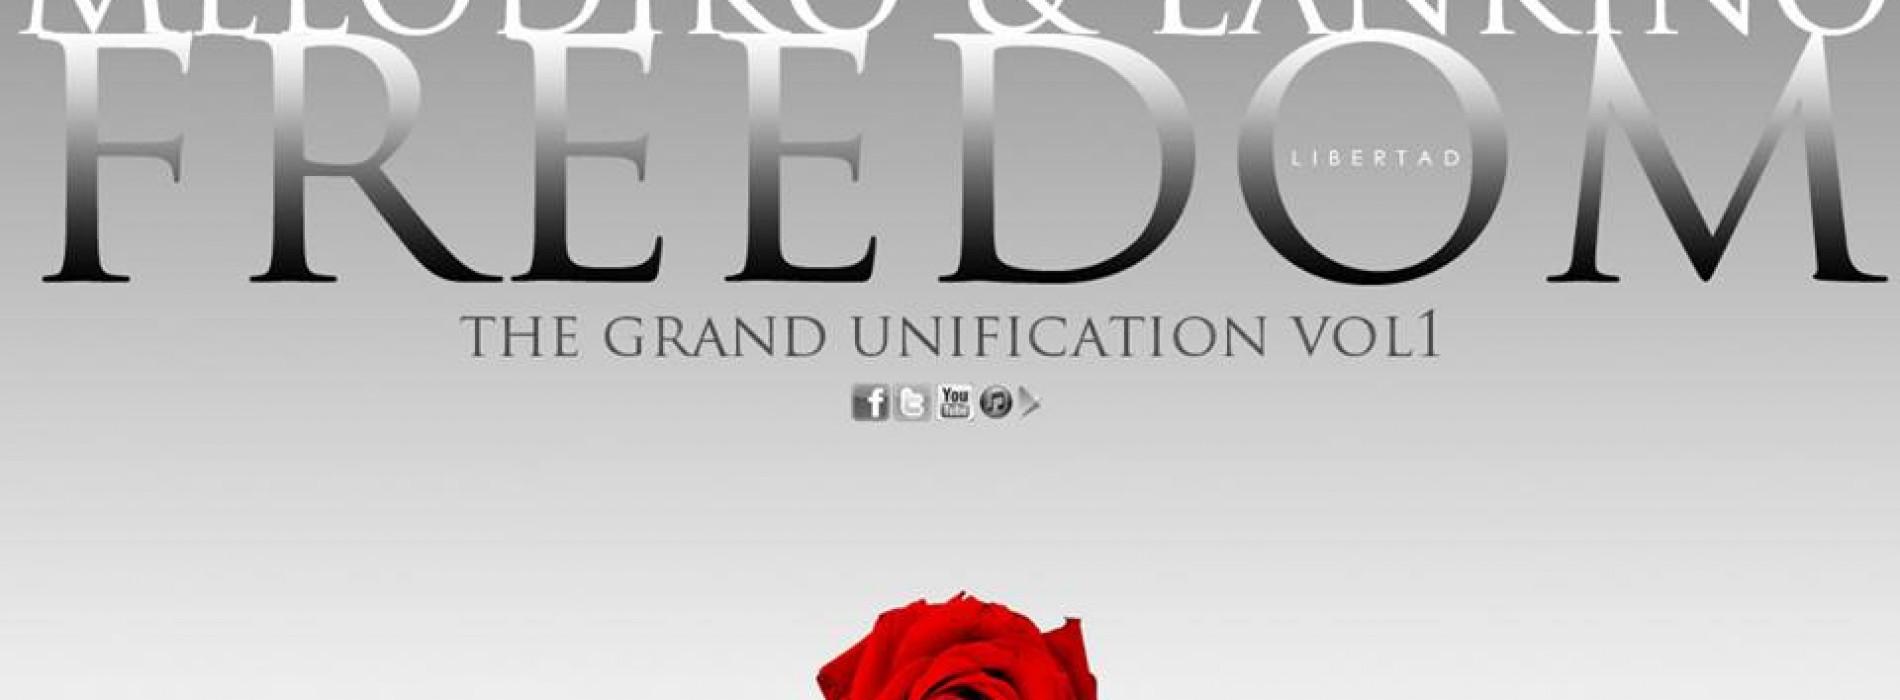 Melodiko & Lankino – Freedom / Libertad [The Grand Unification)